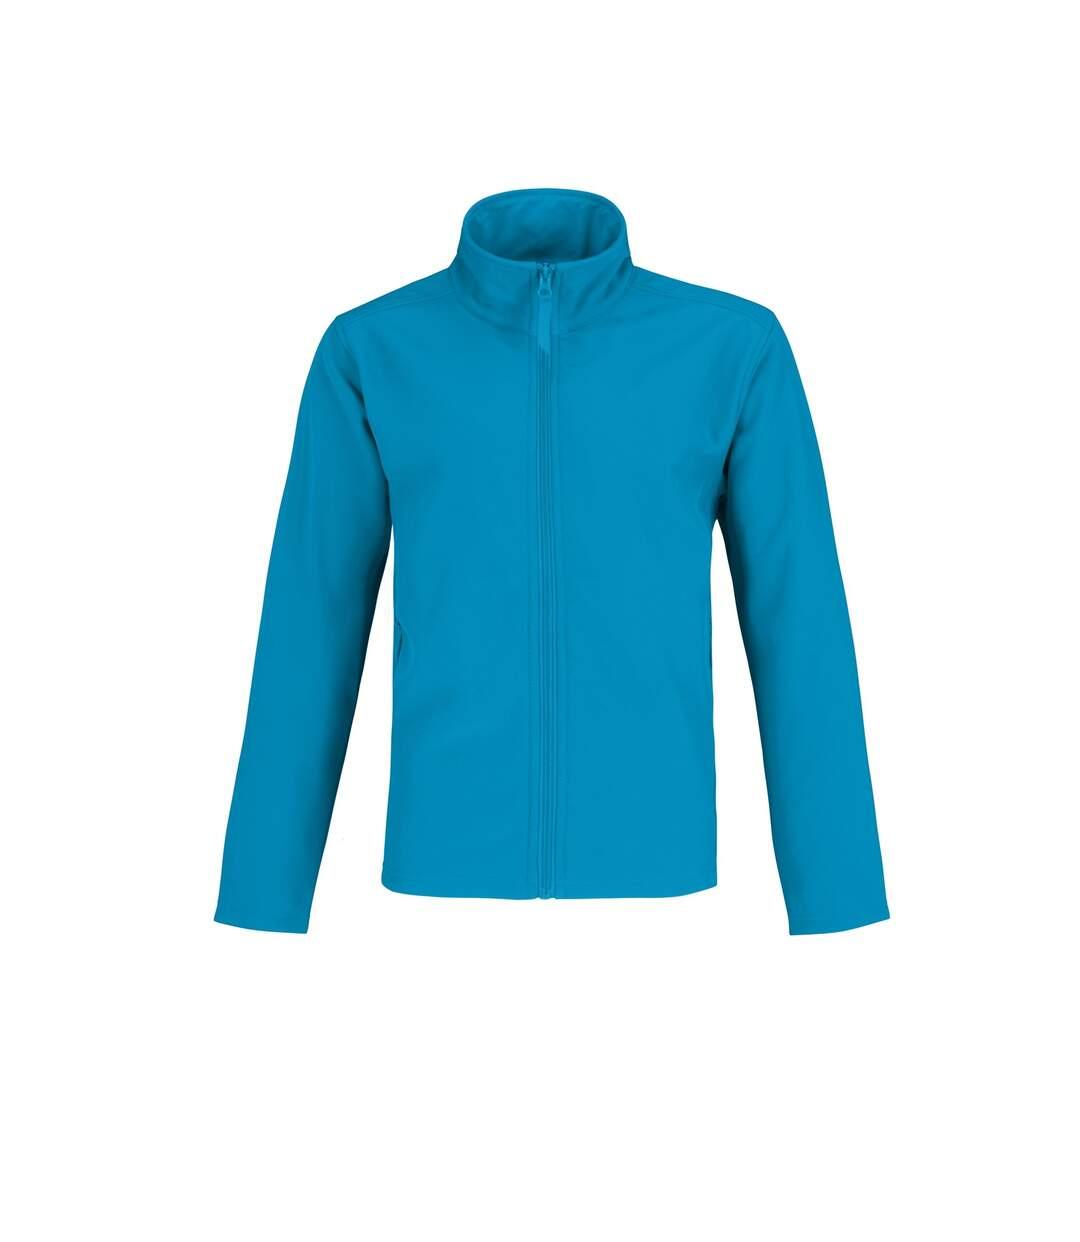 B&C Mens Two Layer Water Repellent Softshell Jacket (Atoll/ Attitude Grey) - UTRW4835